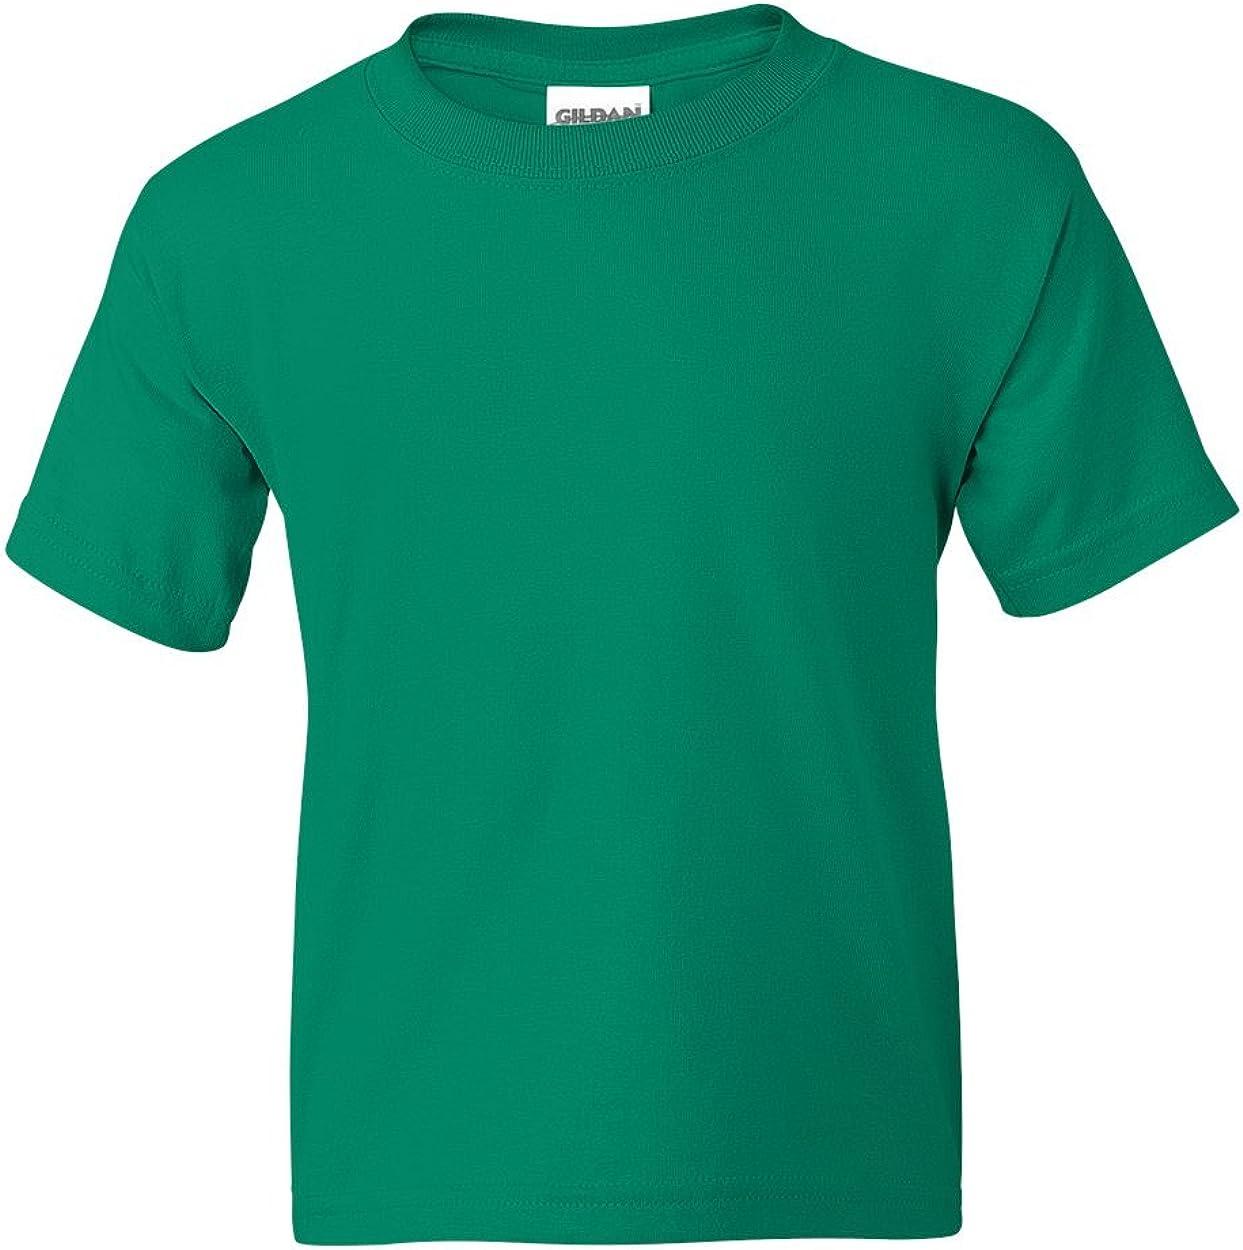 Gildan Activewear 50/50 Ultra Blend Youth Tee Shirt, L, Kelly Green